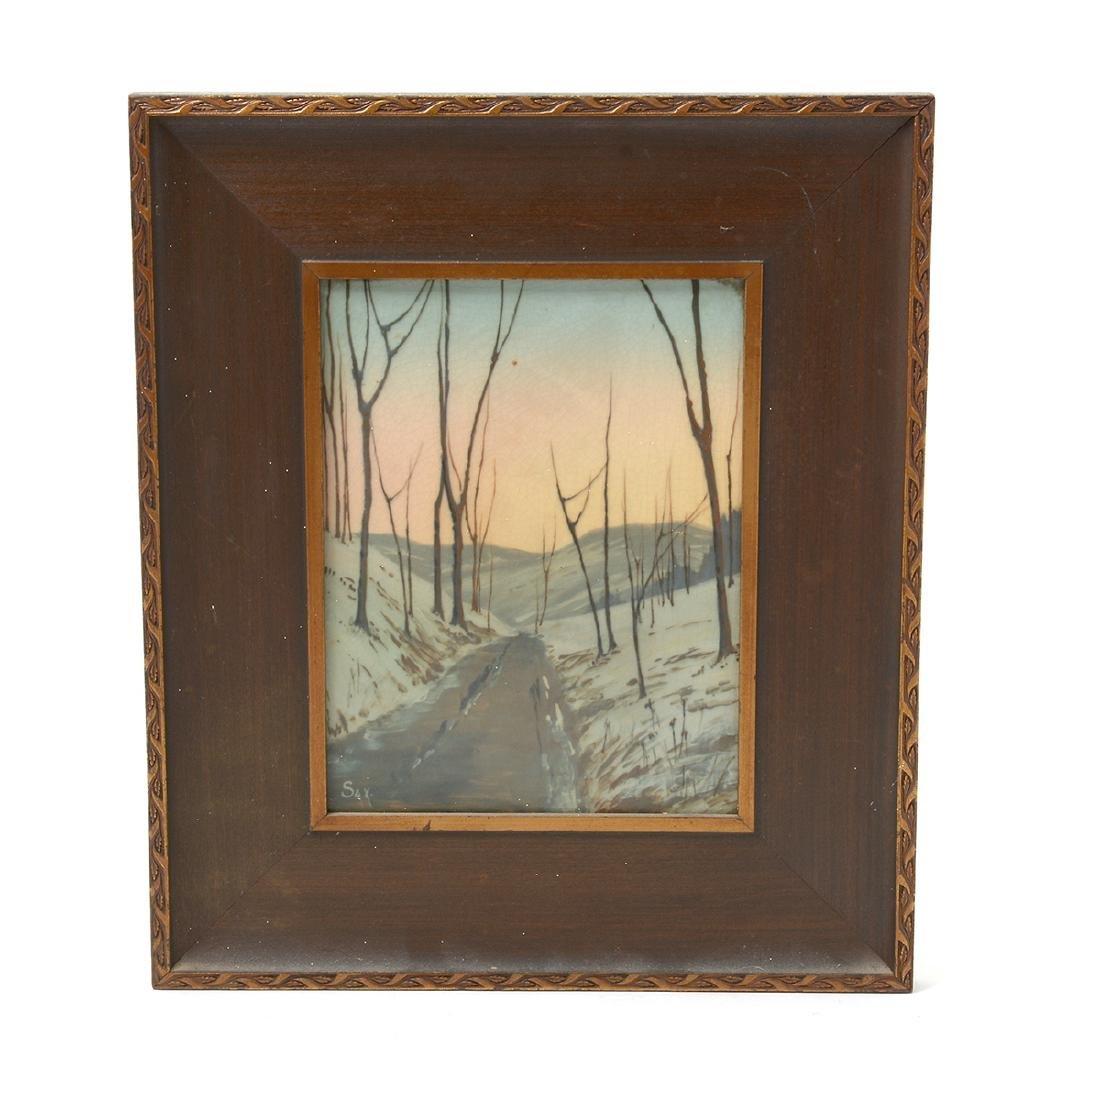 Rookwood Vellum Glazed Plaque, Winter Road Landscape,